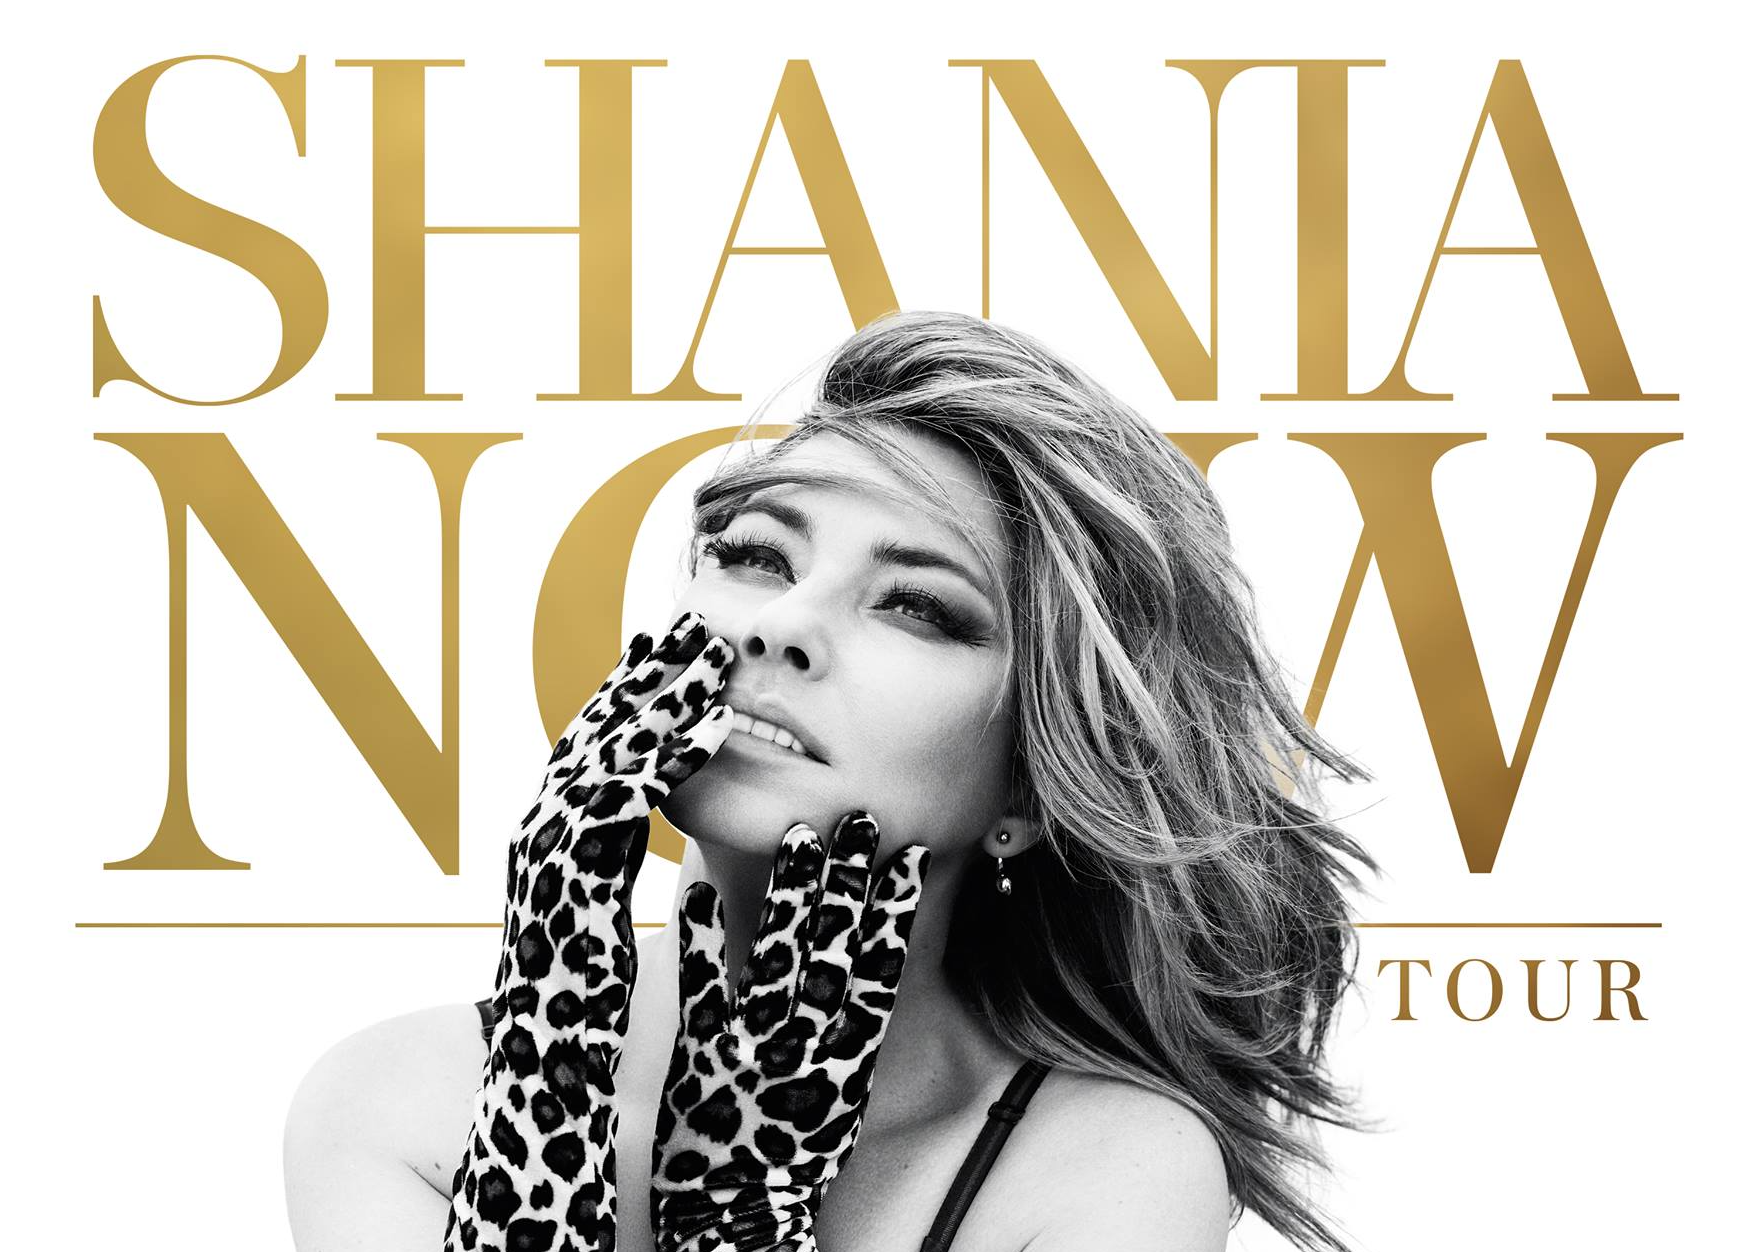 Shania Twain new music